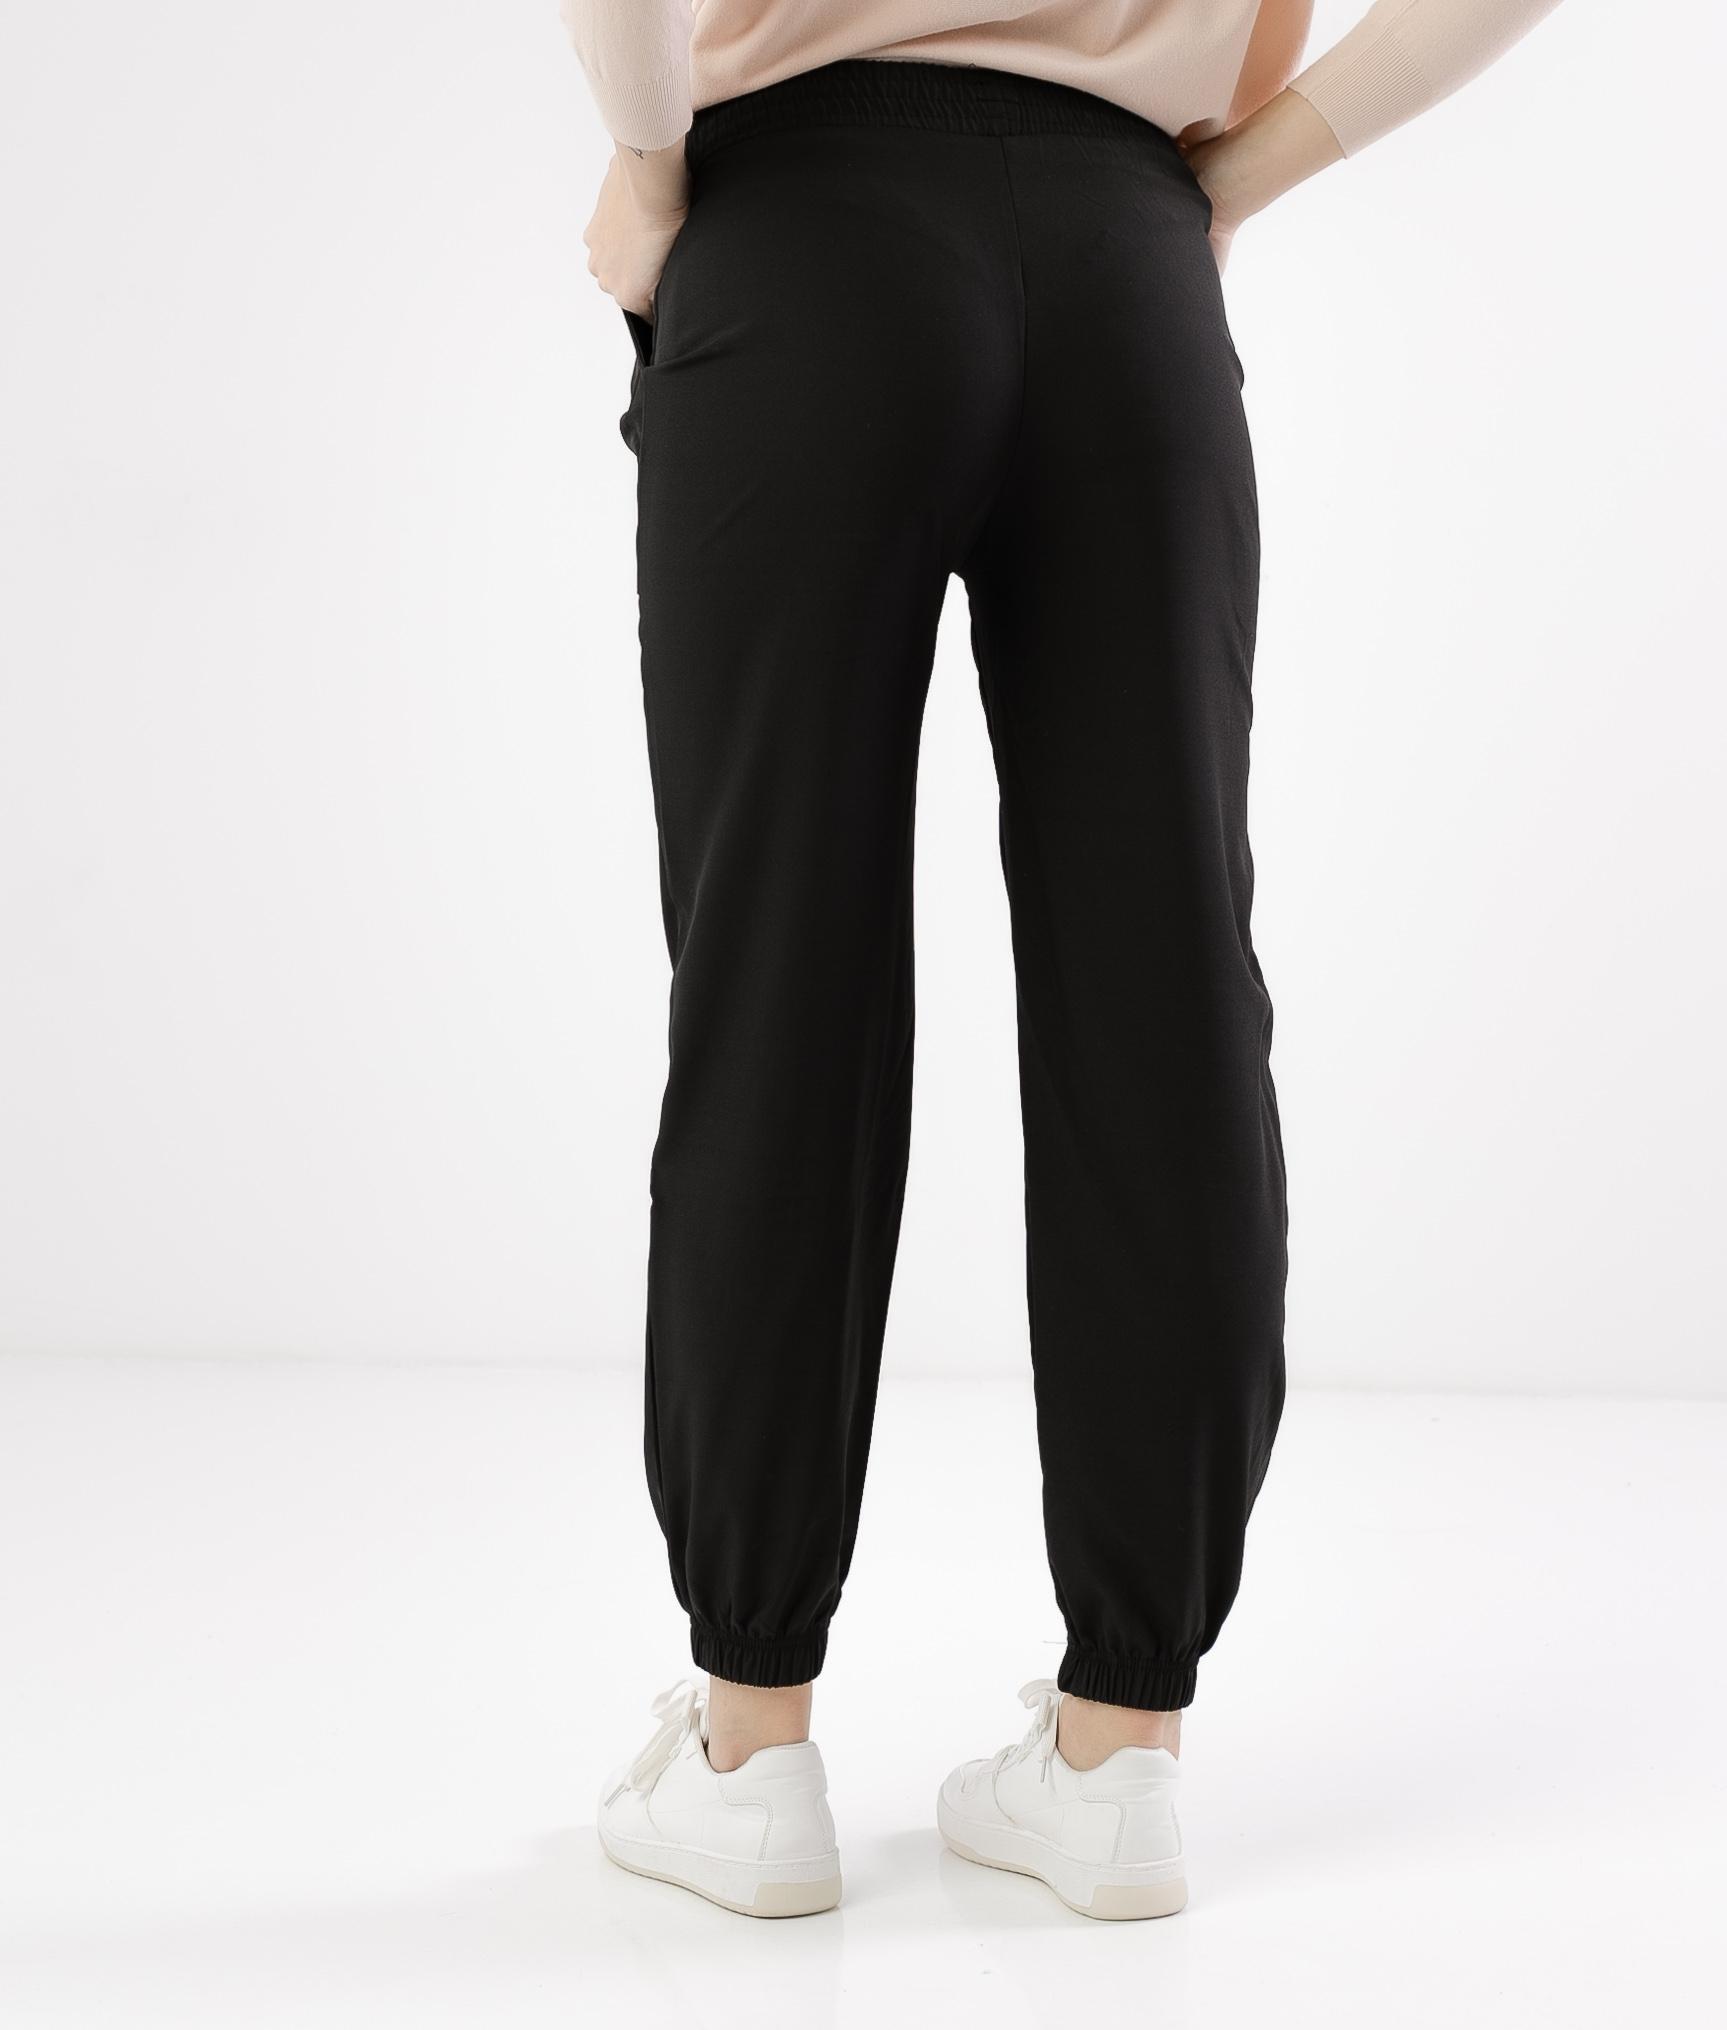 Pantalón Finber - Preto